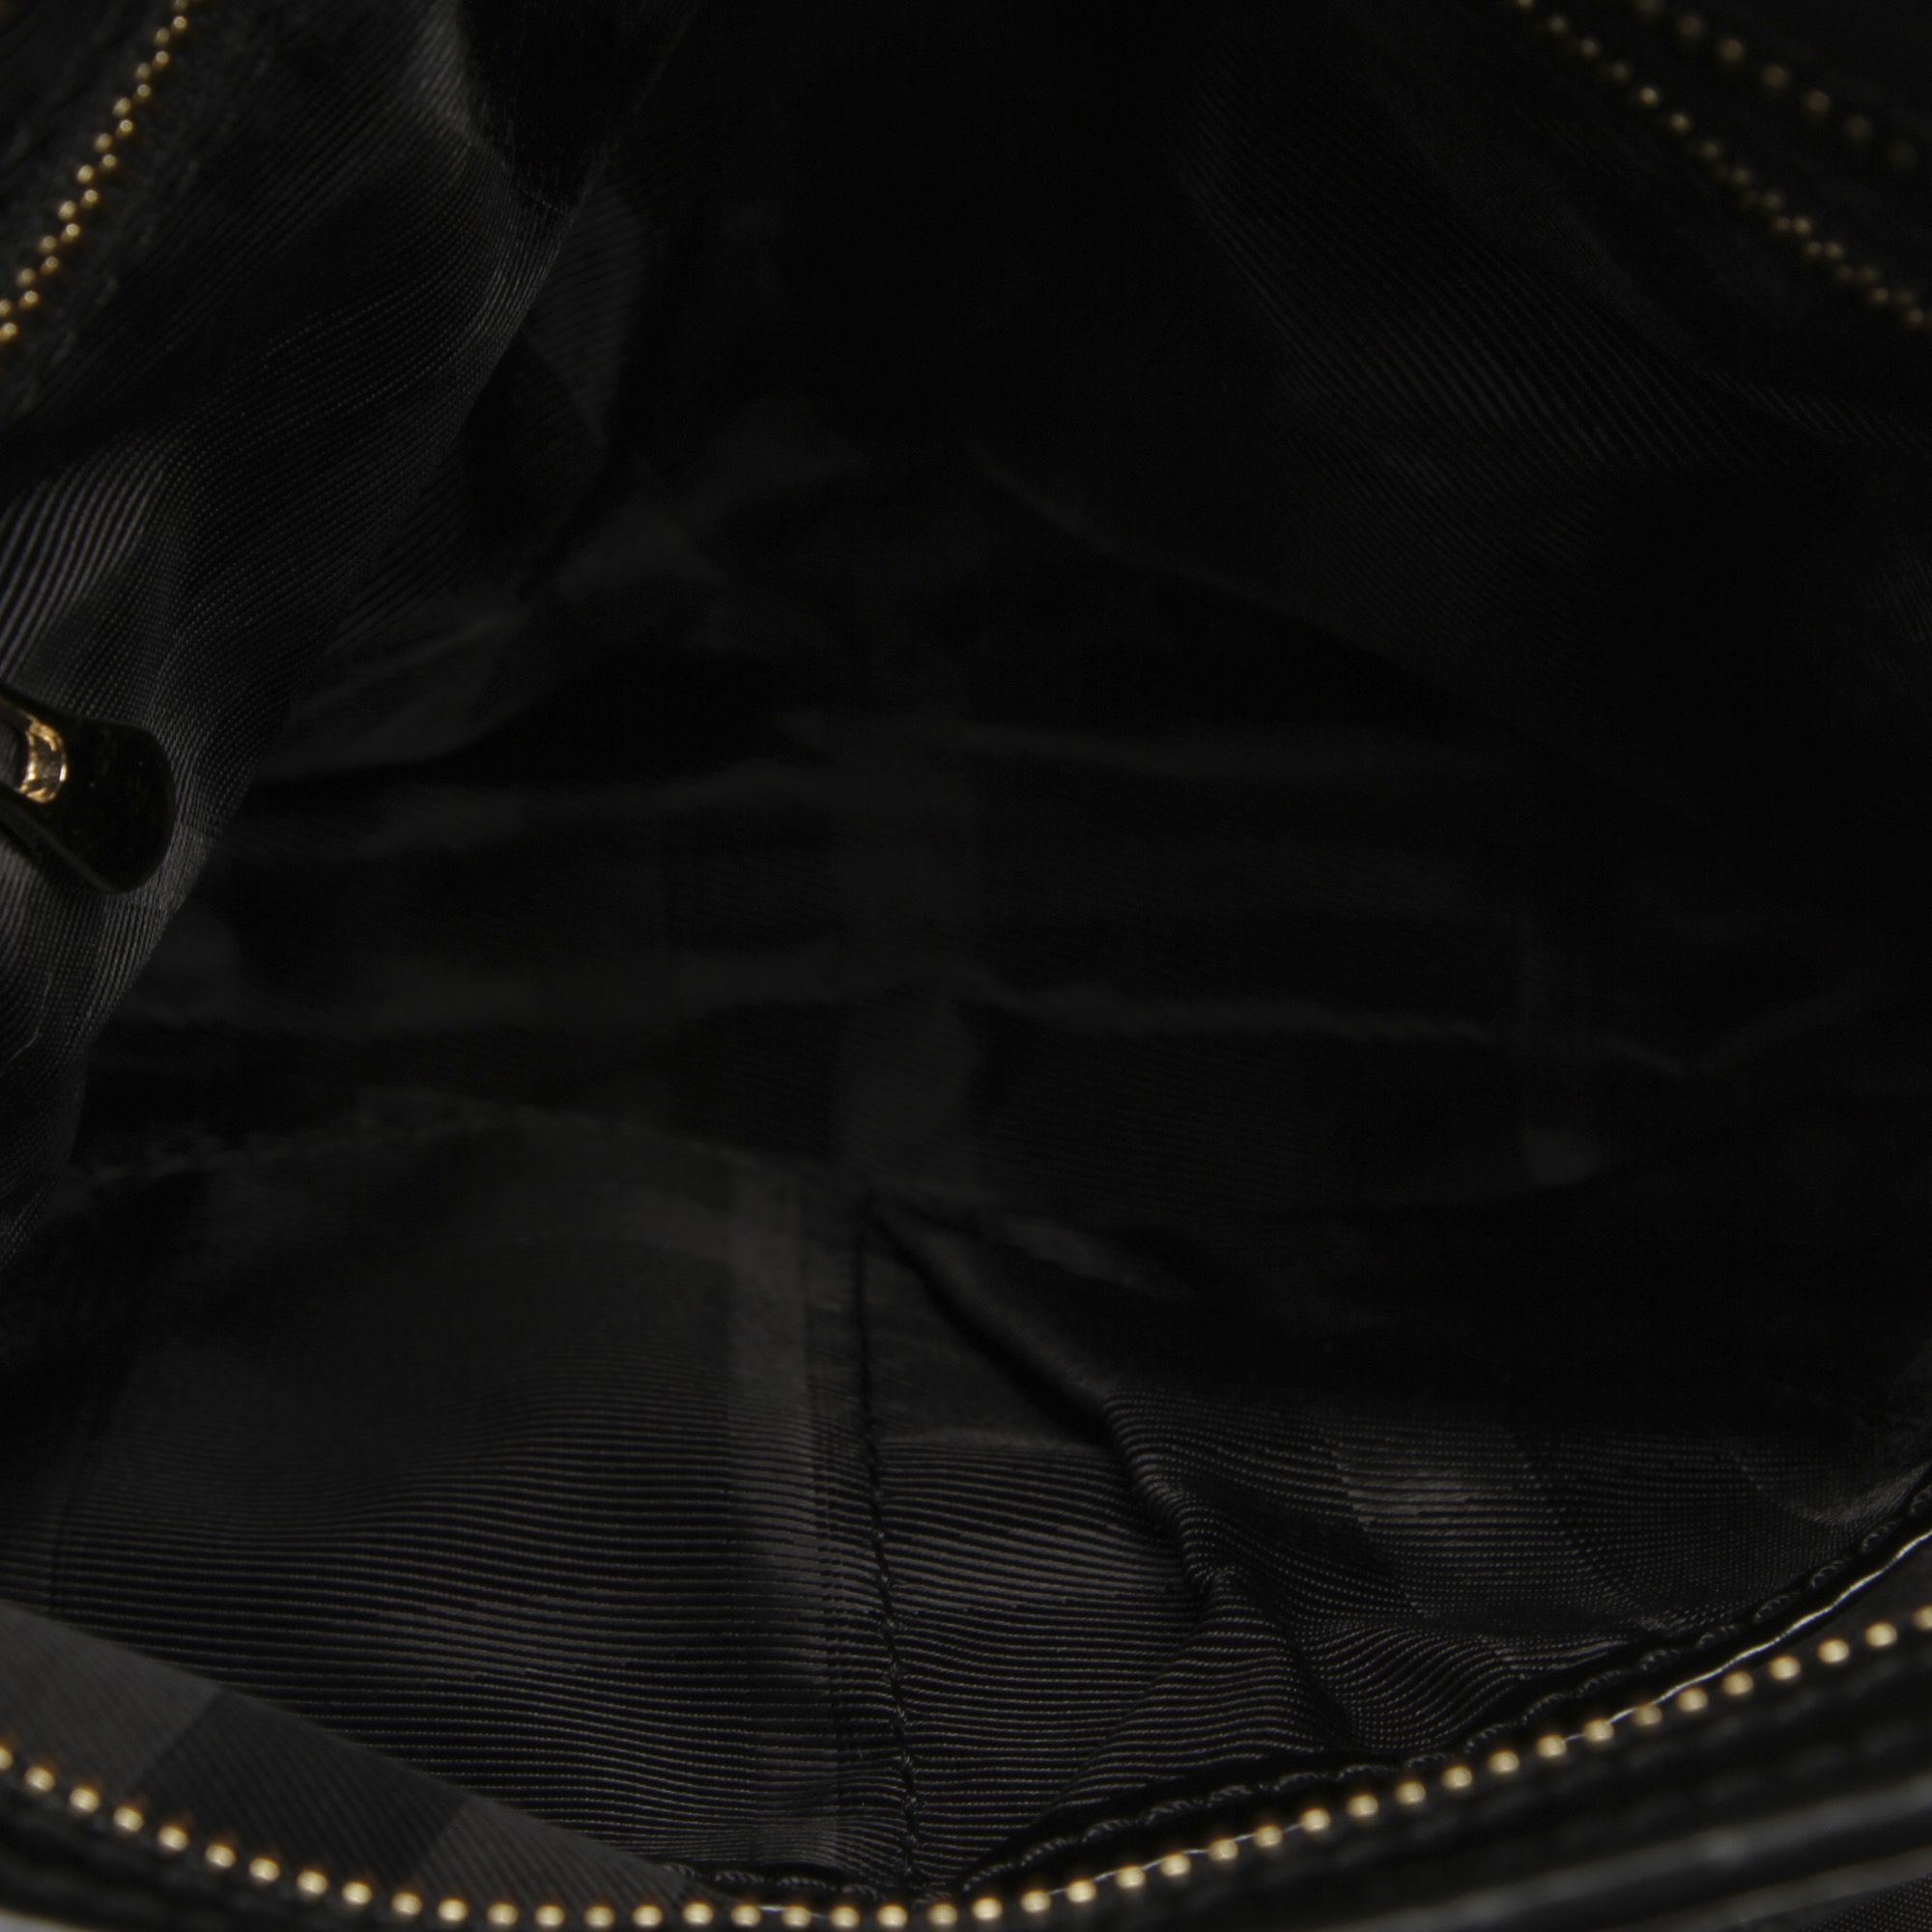 Vintage Burberry Quilted Nylon Crossbody Bag Black